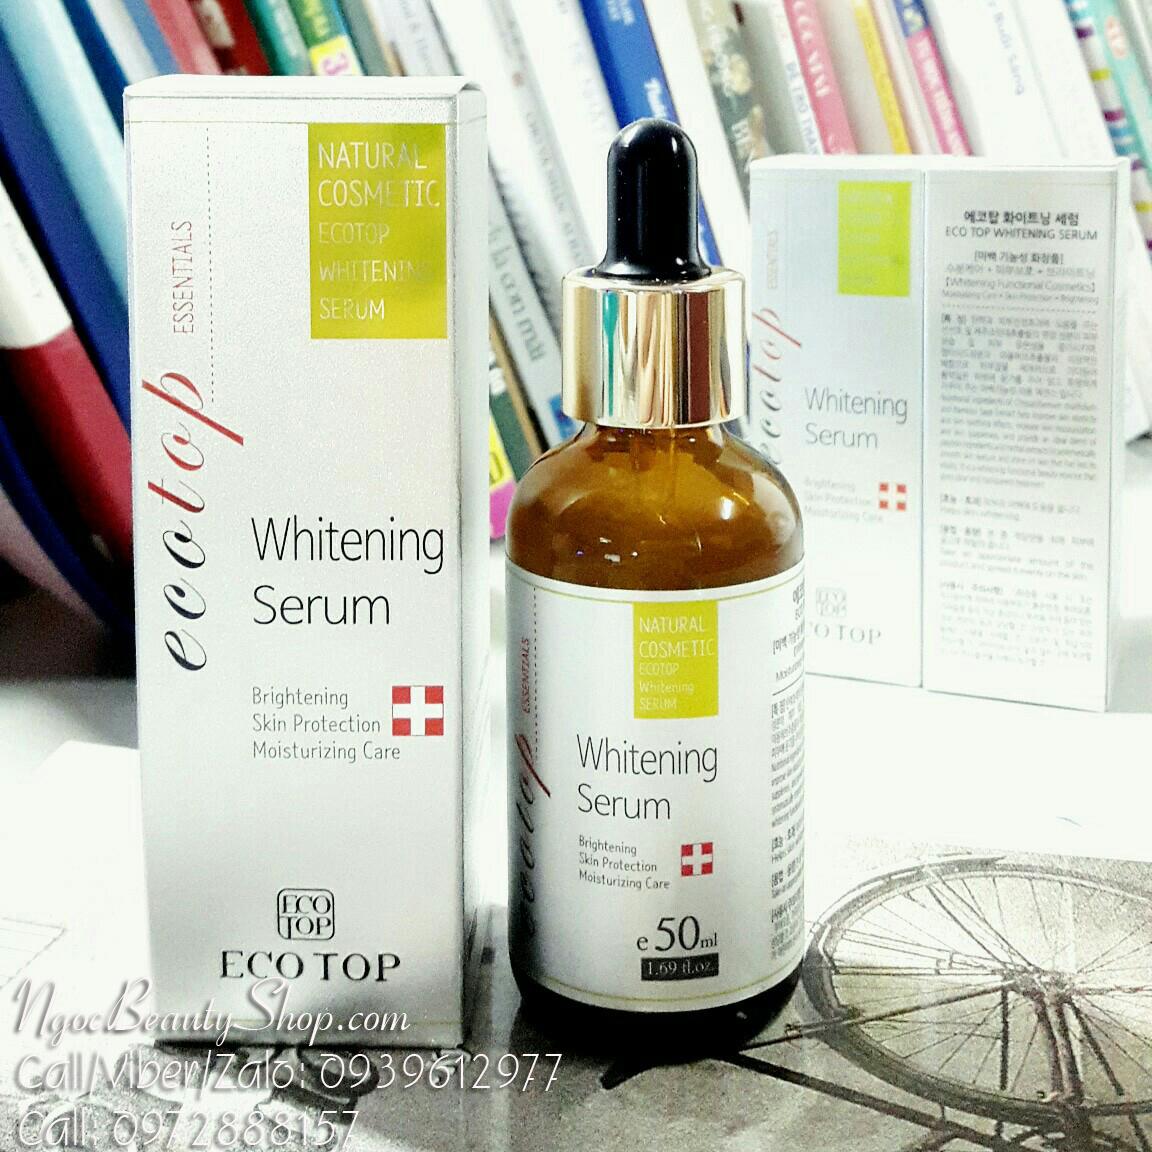 tinh_chat_duong_trang_da_ecotop_han_quoc_ecotop_whitening_serum_ngocbeautyshop.com_3